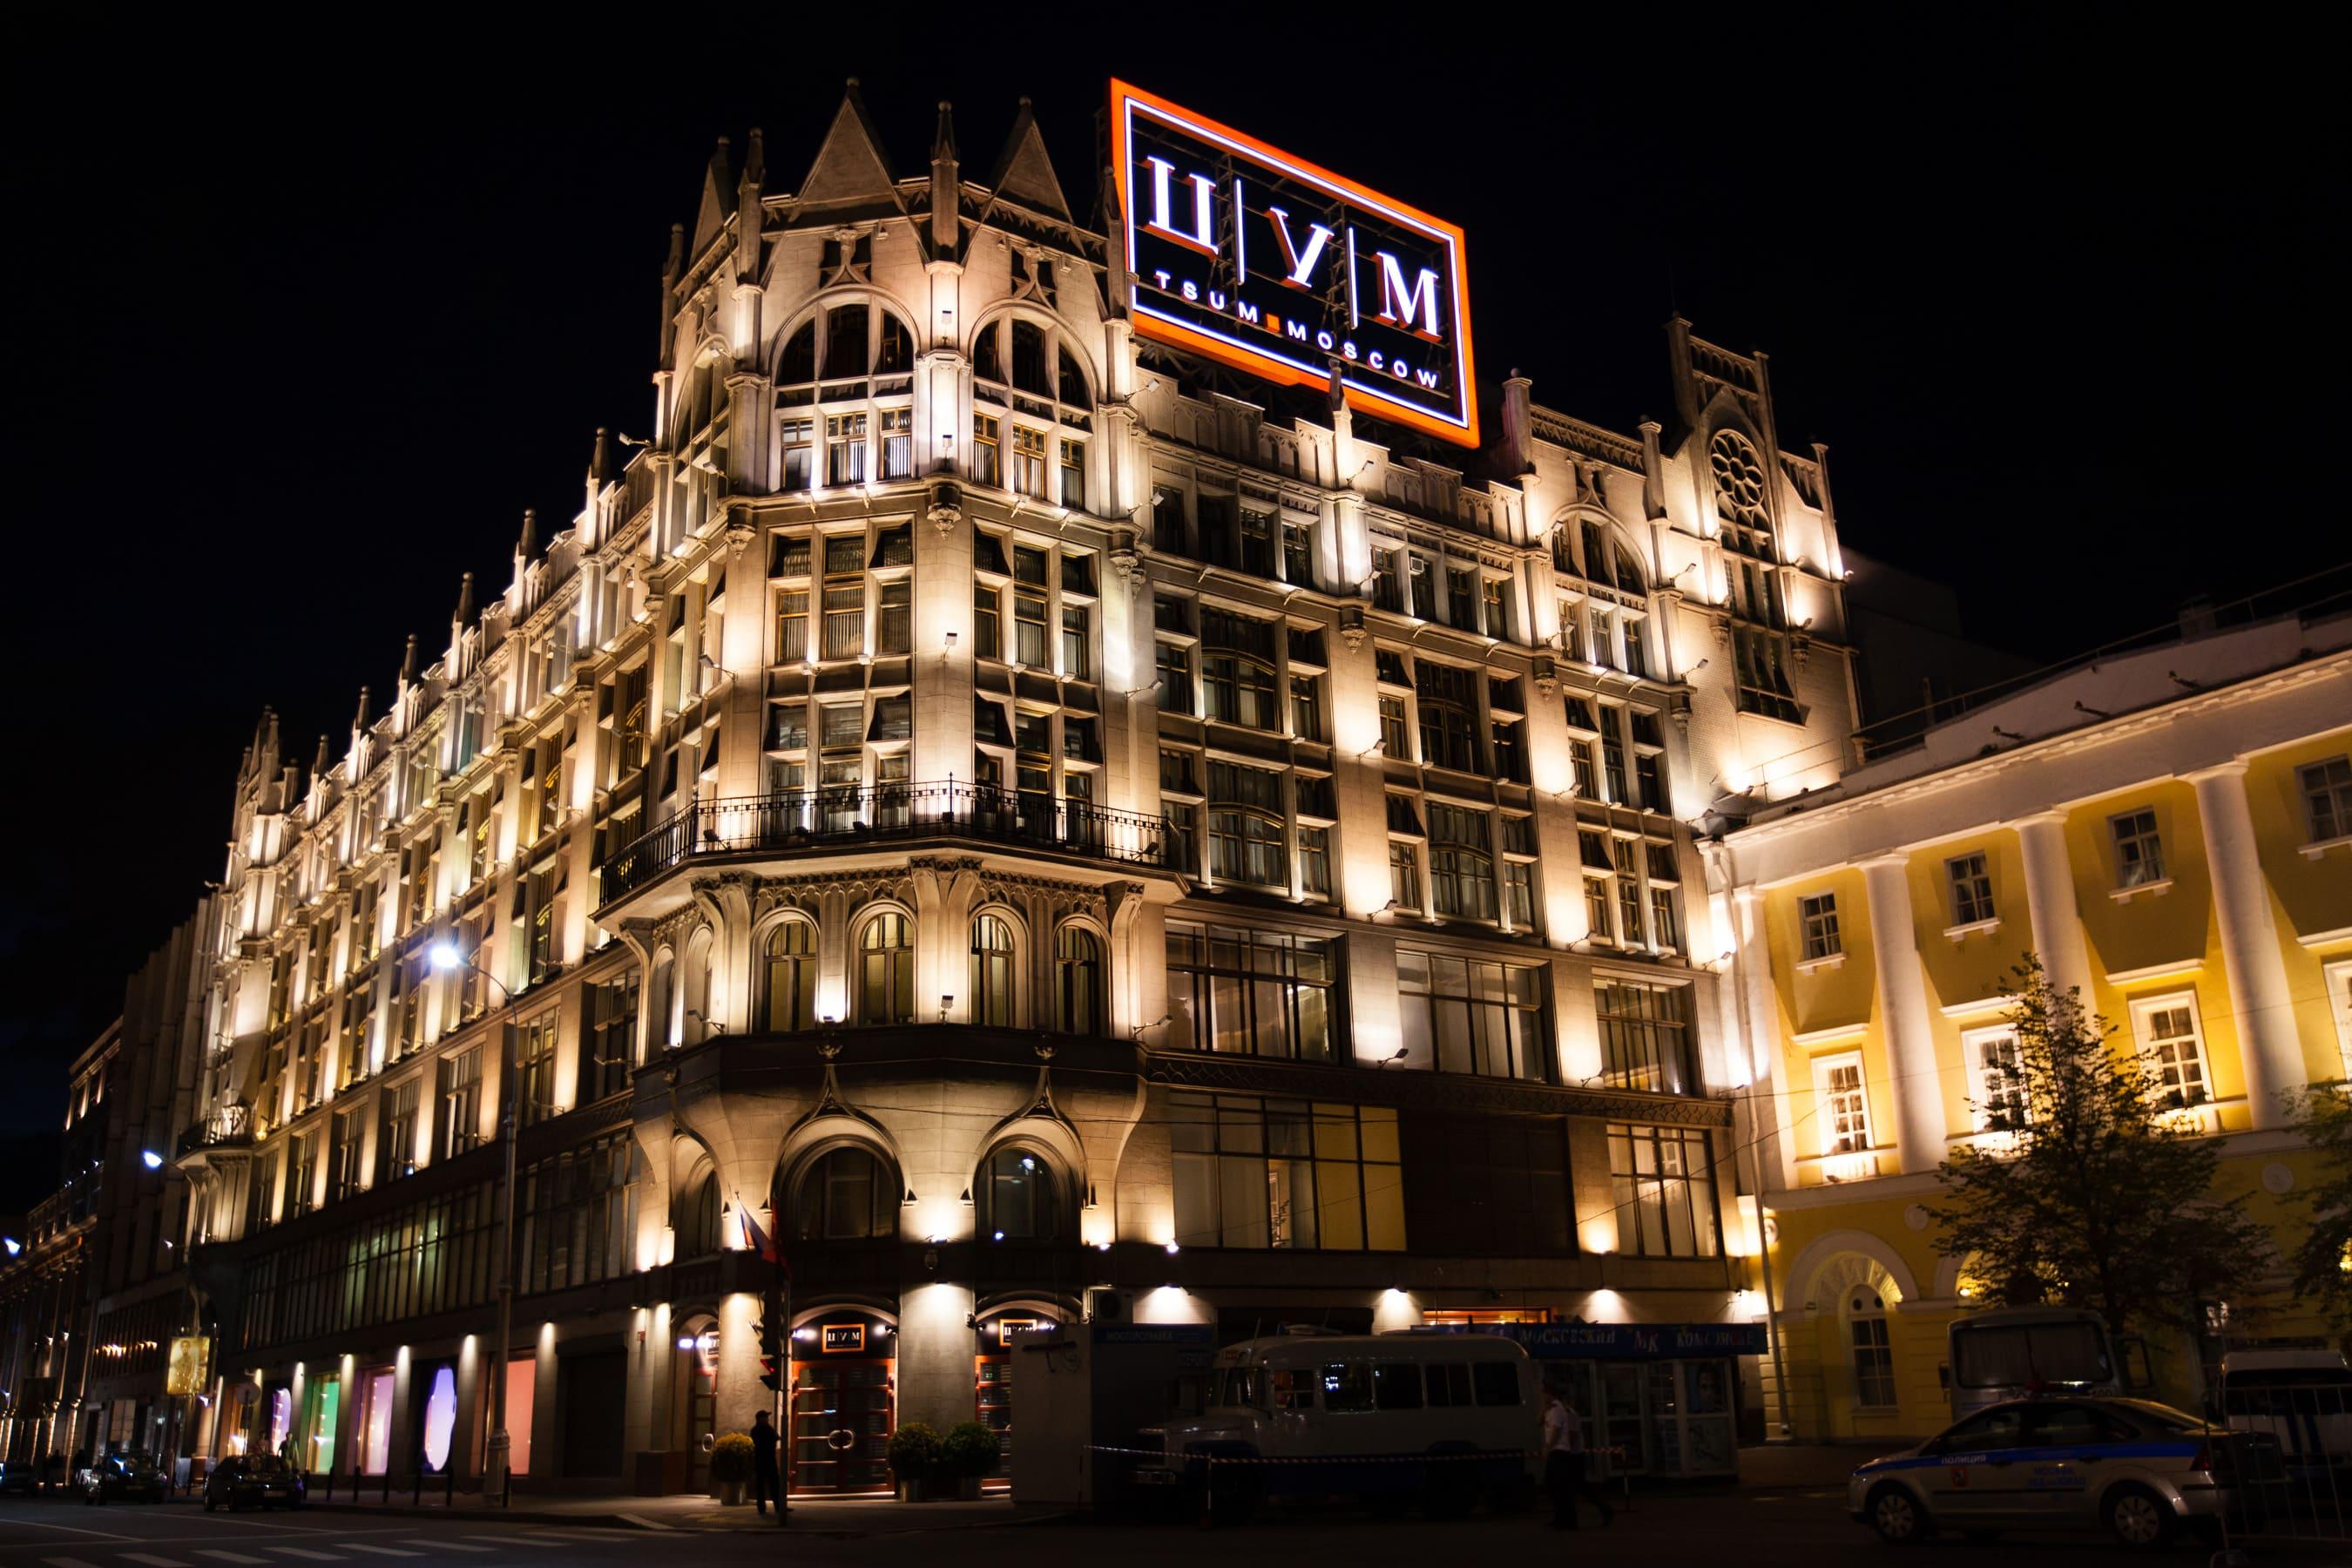 Kinh nghiệm mua sắm ở Moscow